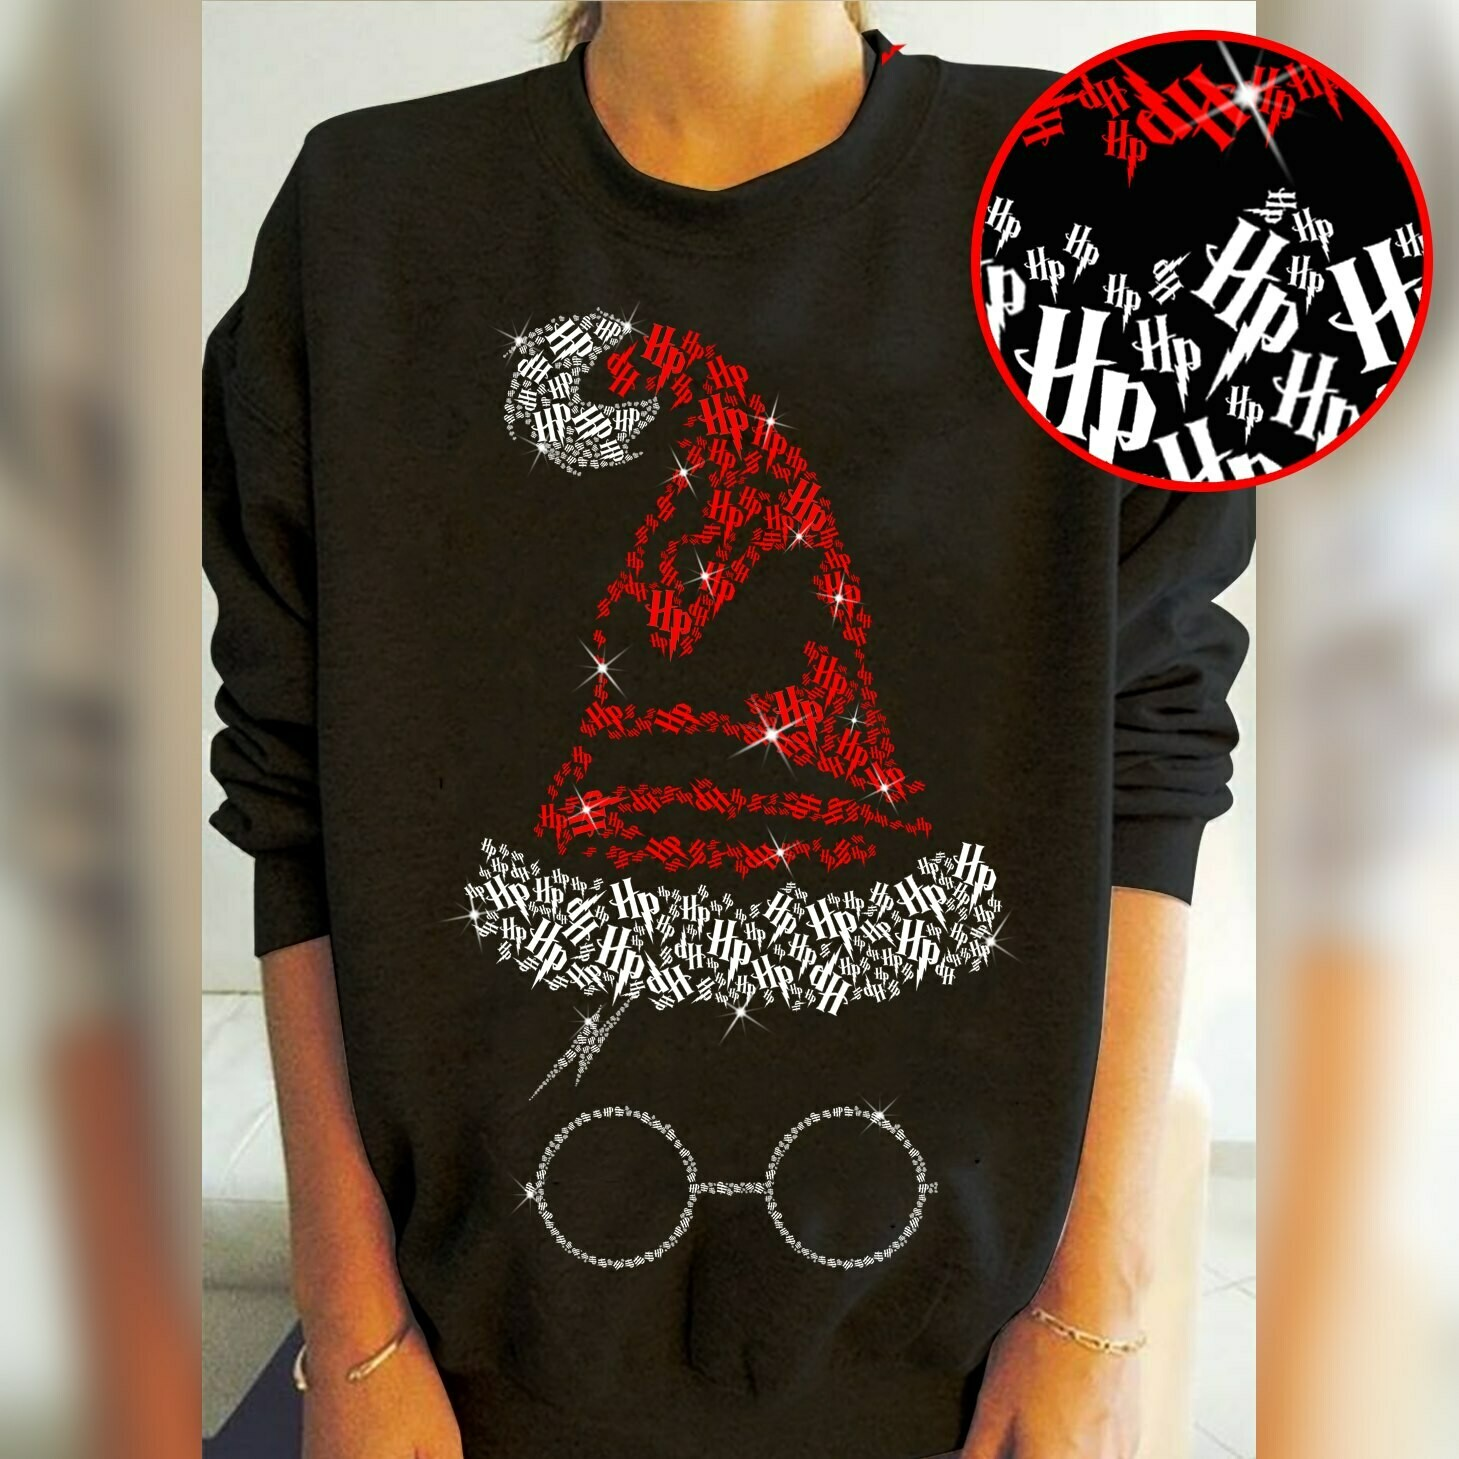 Harry Potter Merry Christmas Shirt, Harry Potter Inspired Womens TShirt, Harry Potter Gift, Unisex Wizard, Hogwarts Tee, Harry Poter, Harry Potter Patronus Daniel Radcliffe Emma Watson Christmas shirt